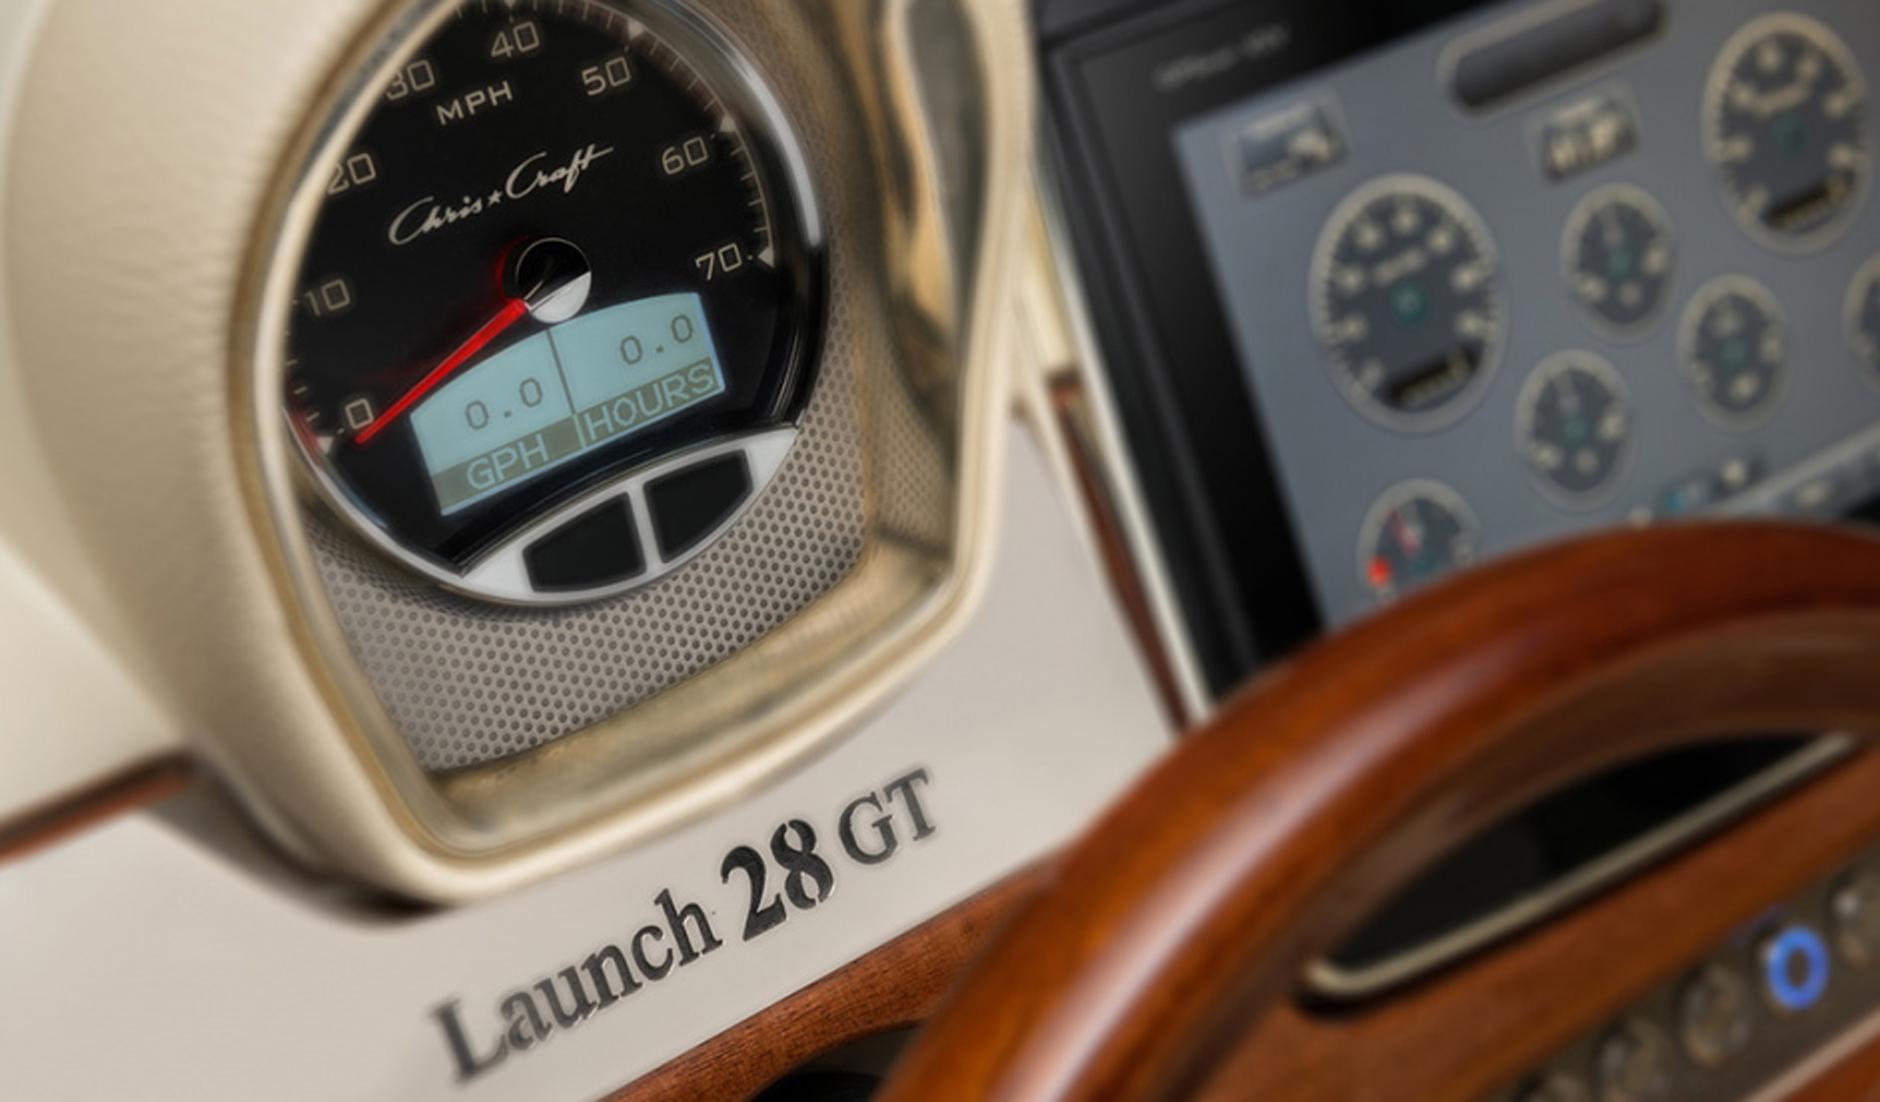 Chris-Craft Launch 28 GT Фото № 6